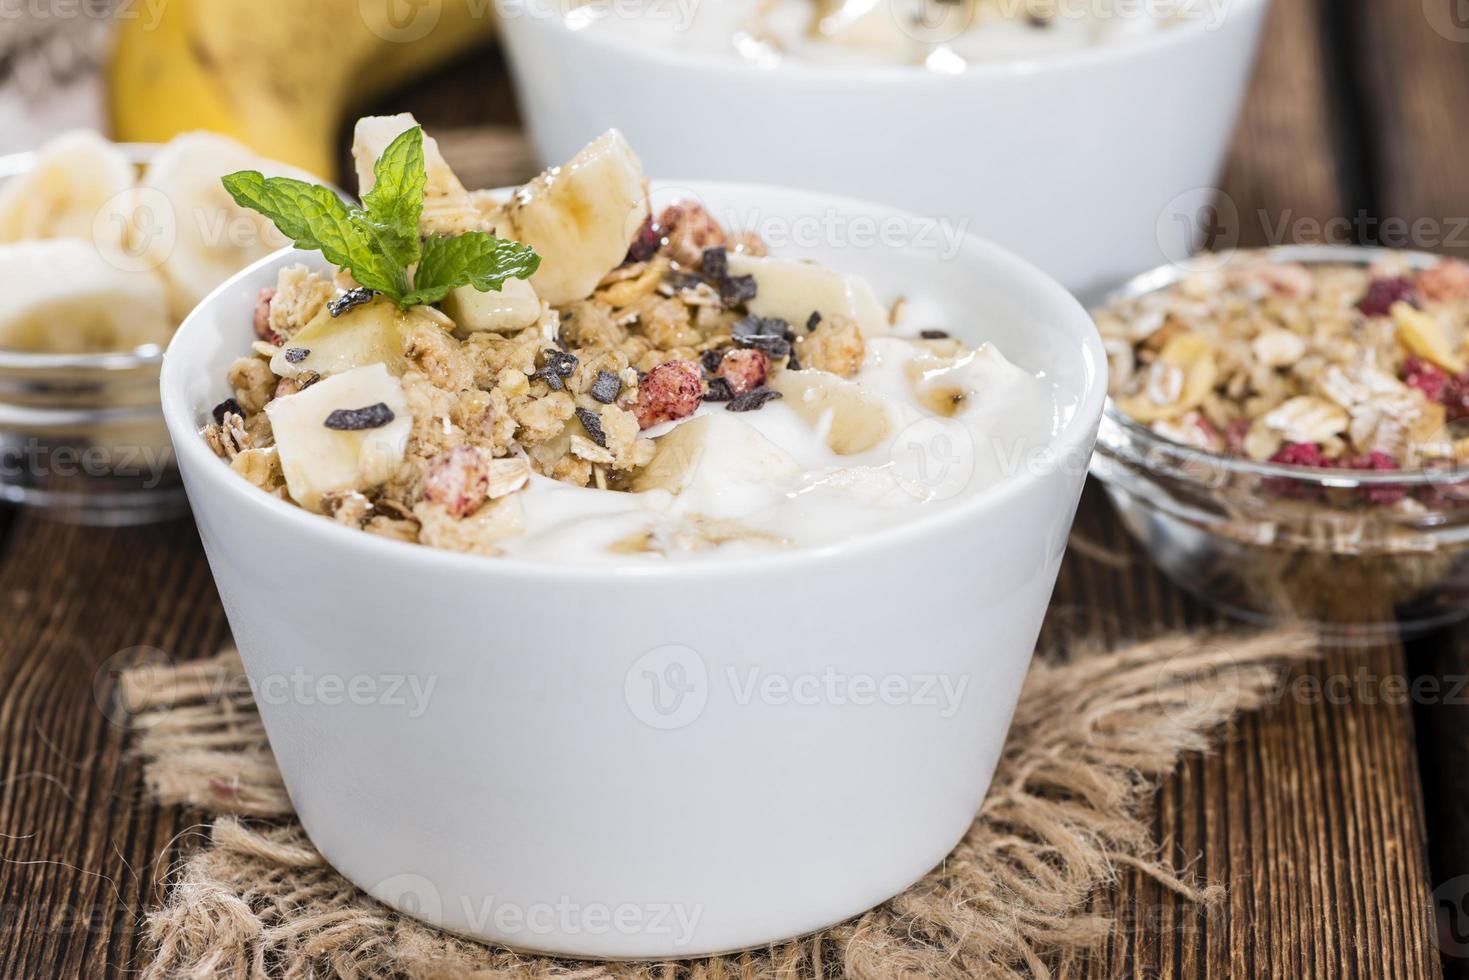 Bananenjoghurt foto